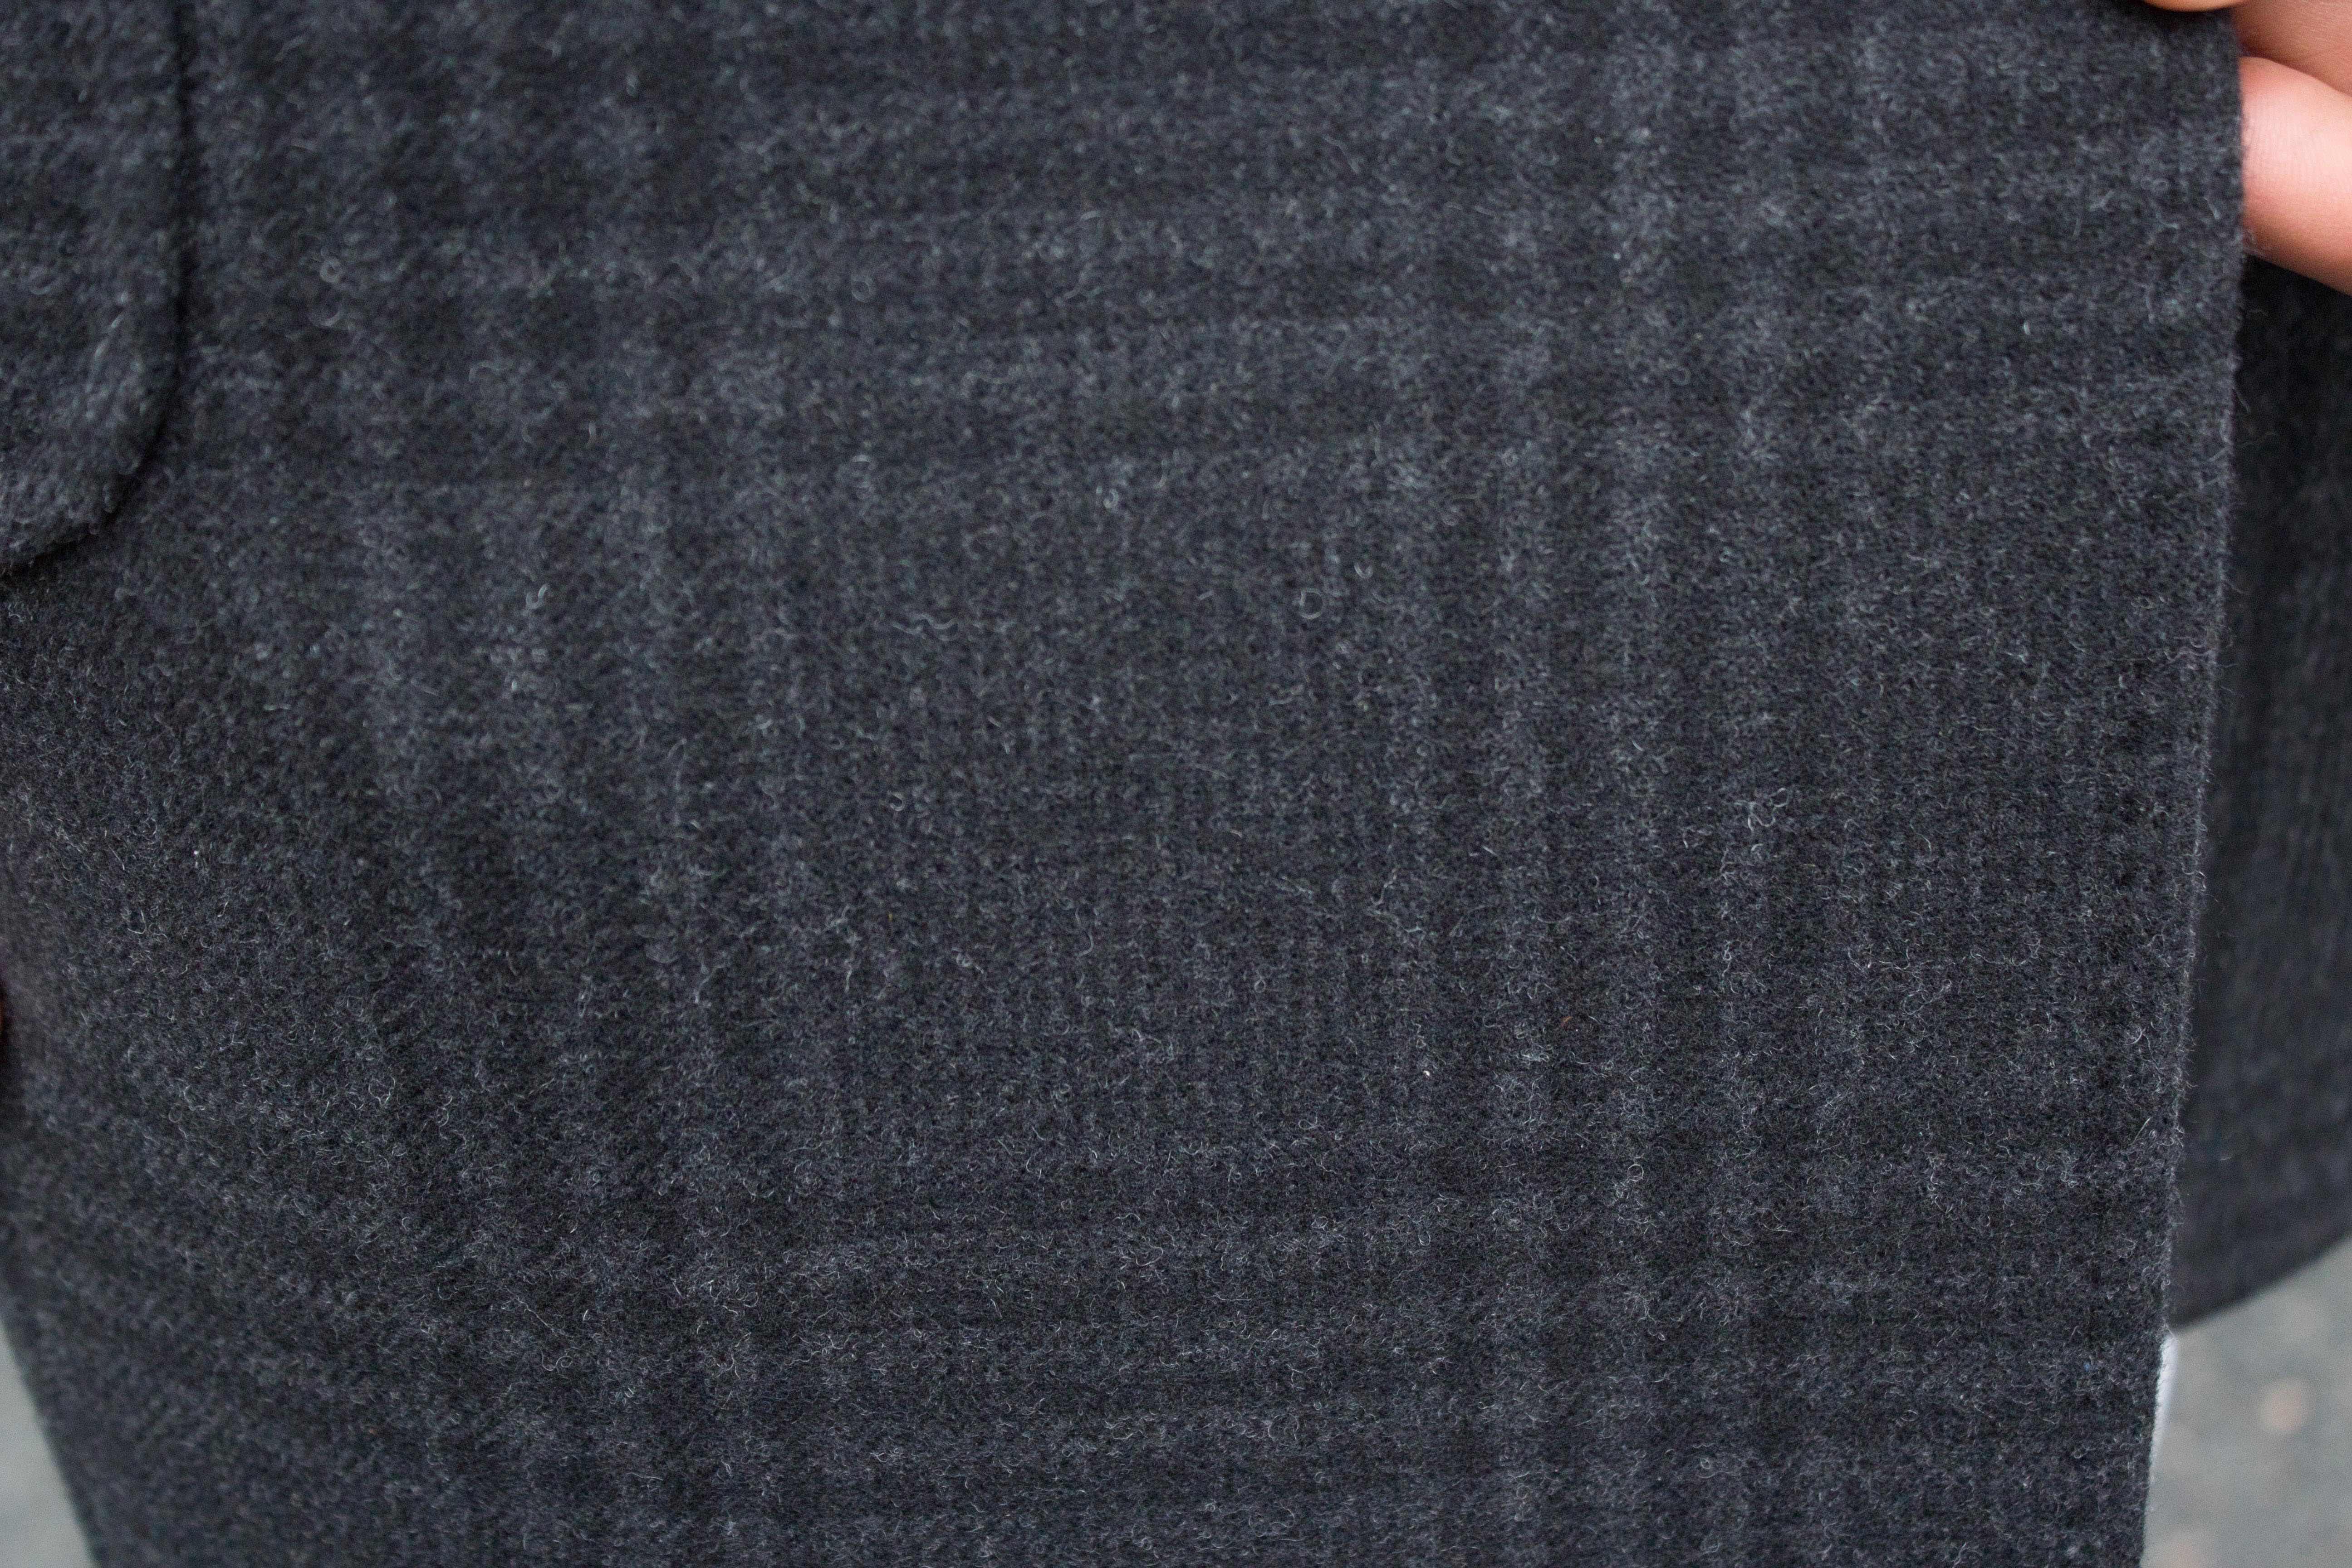 Aperçu tissu et surpiqûres